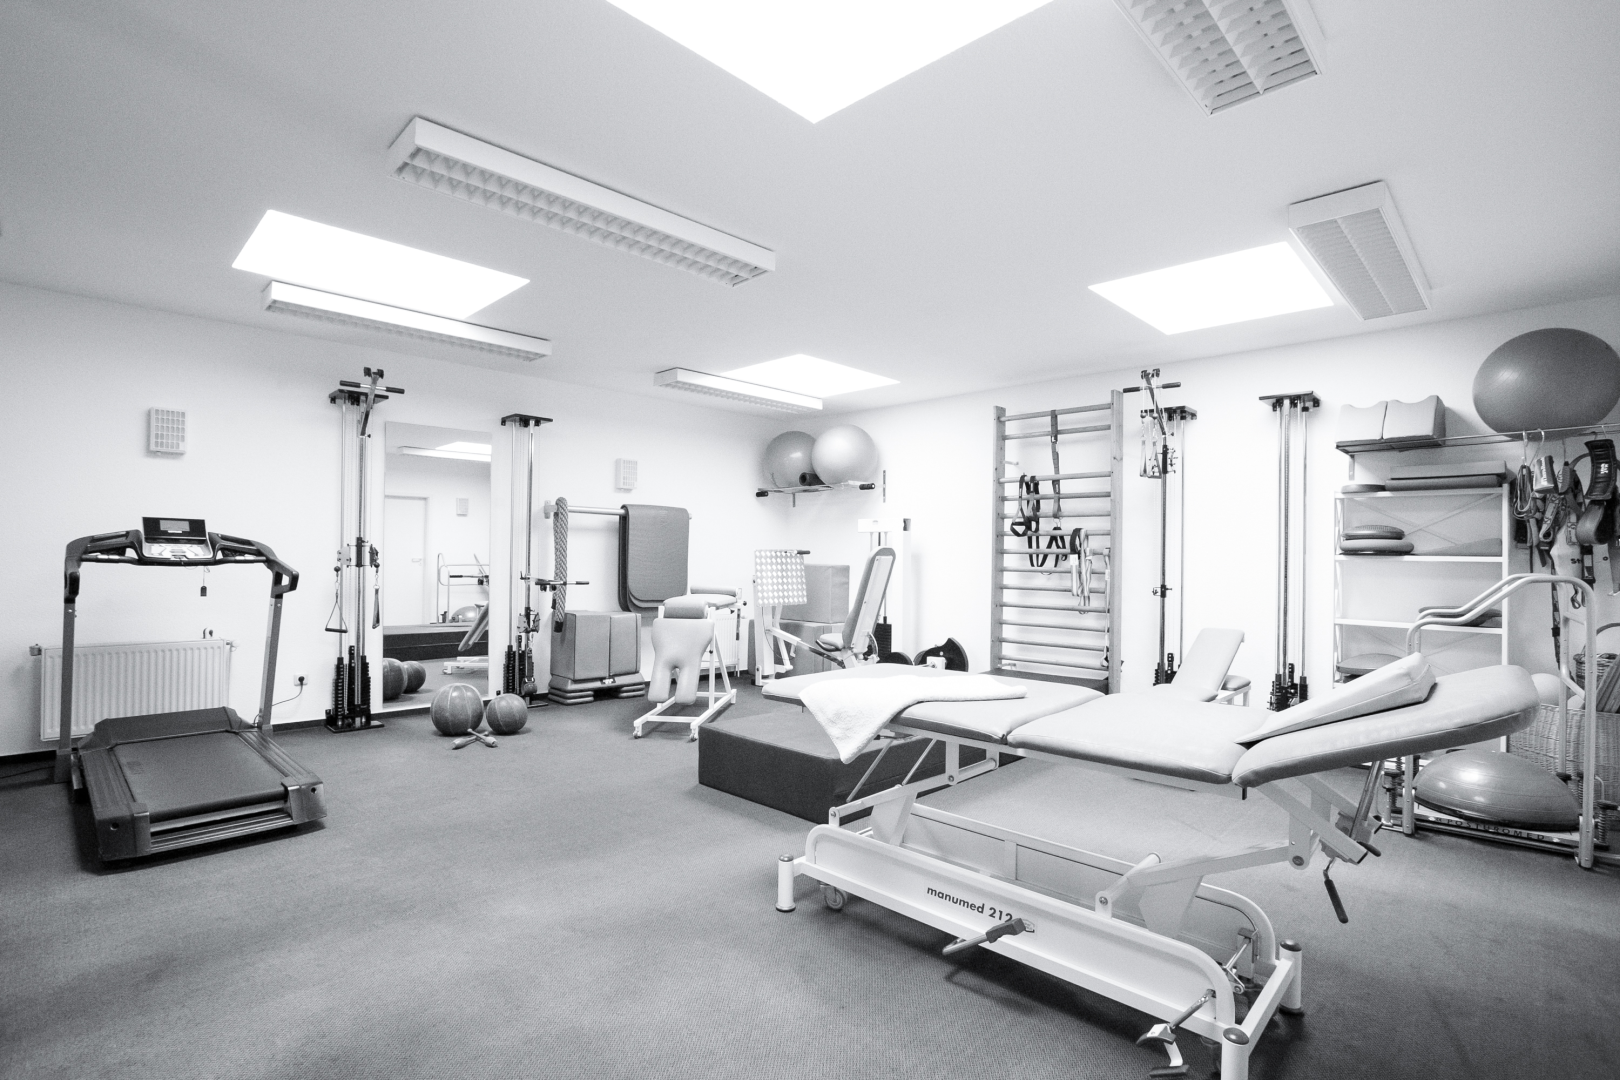 physiotherapiezentrum rostock – martin moratz-12